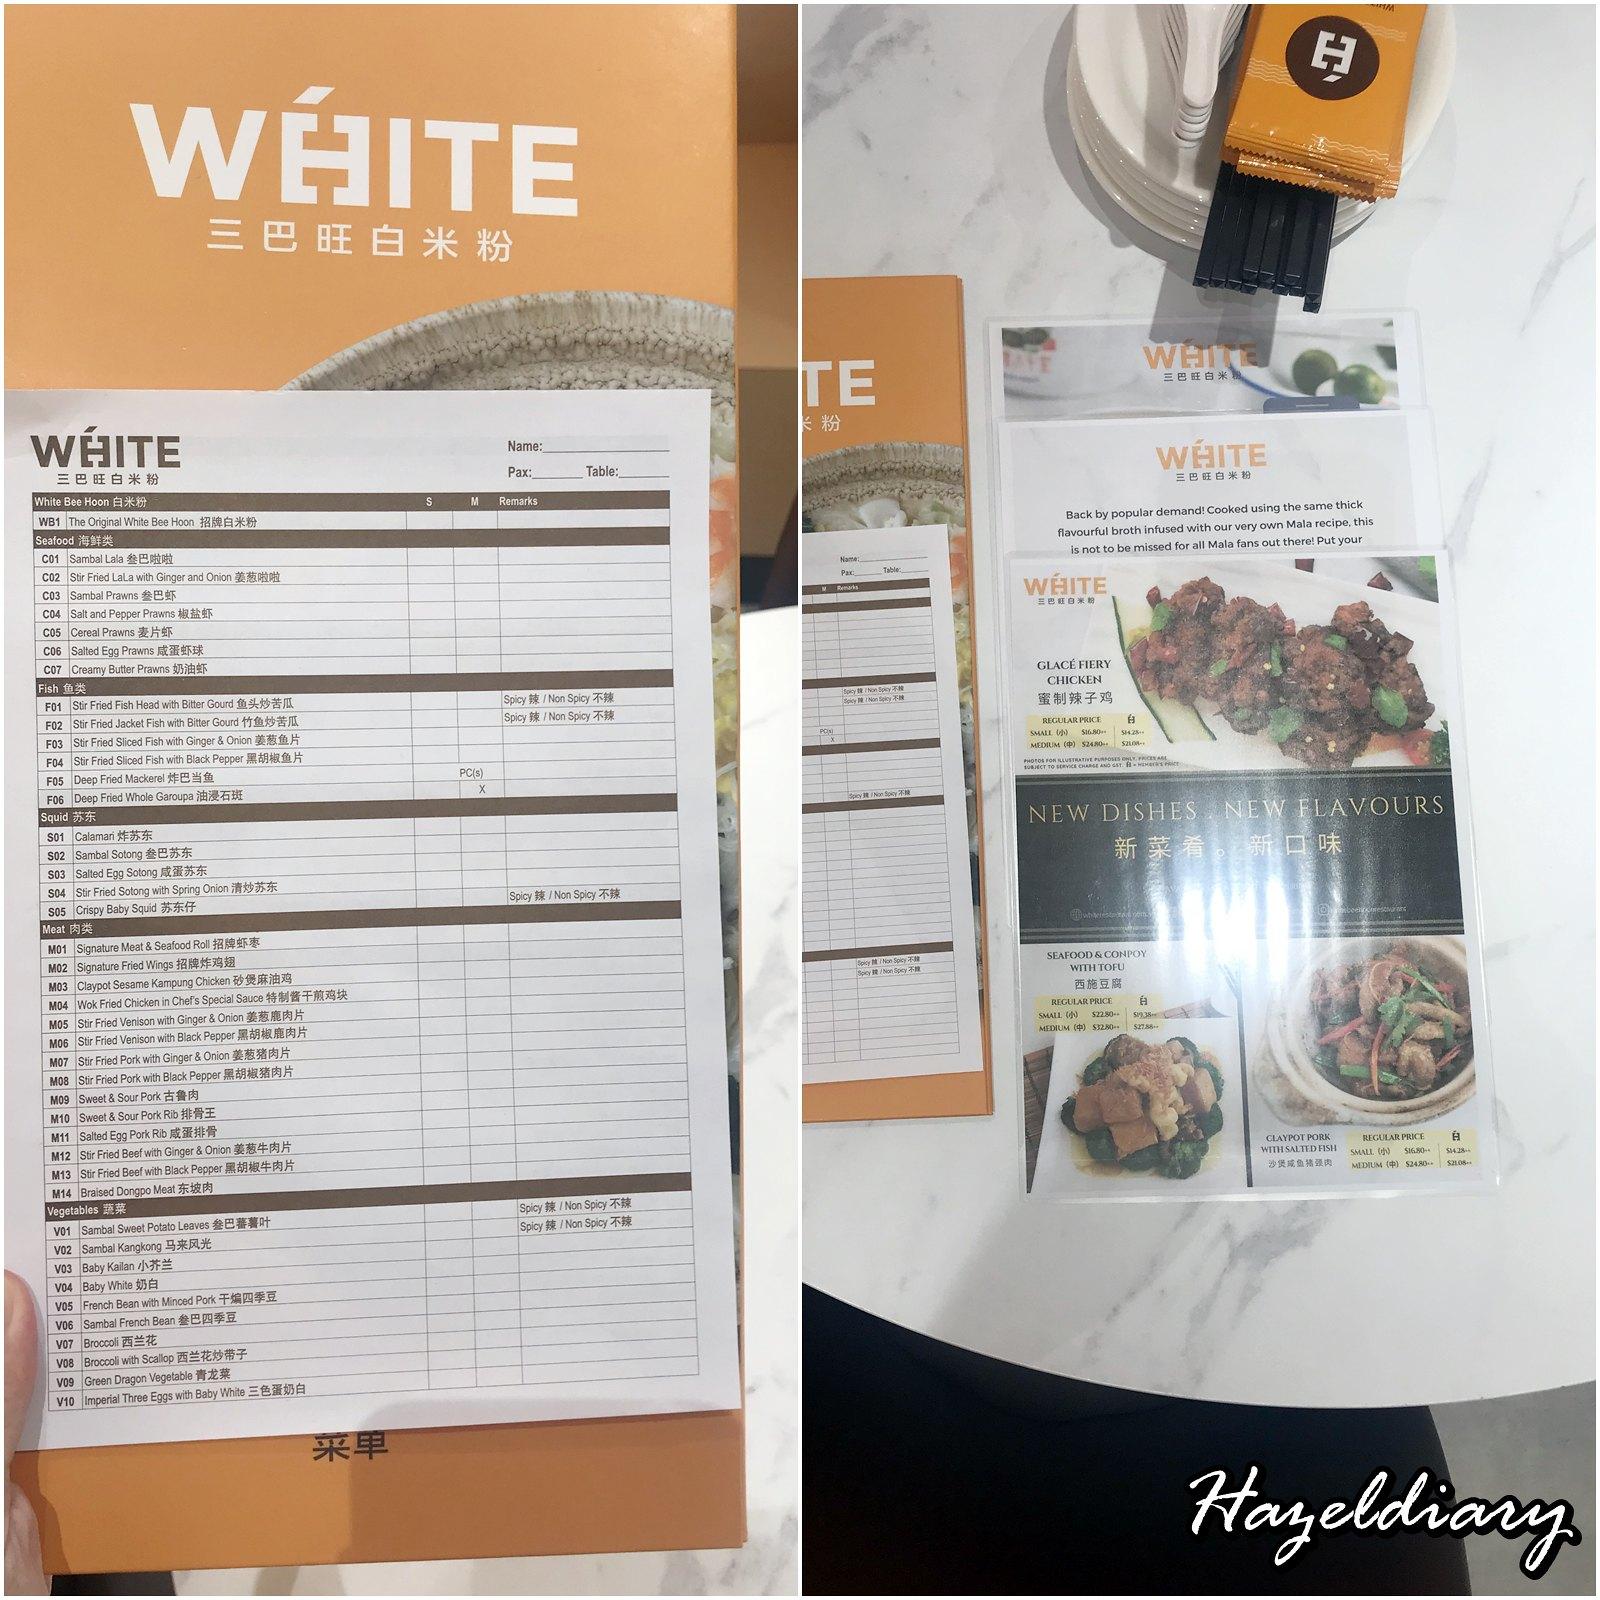 White Bee Hoon Restaurant-2